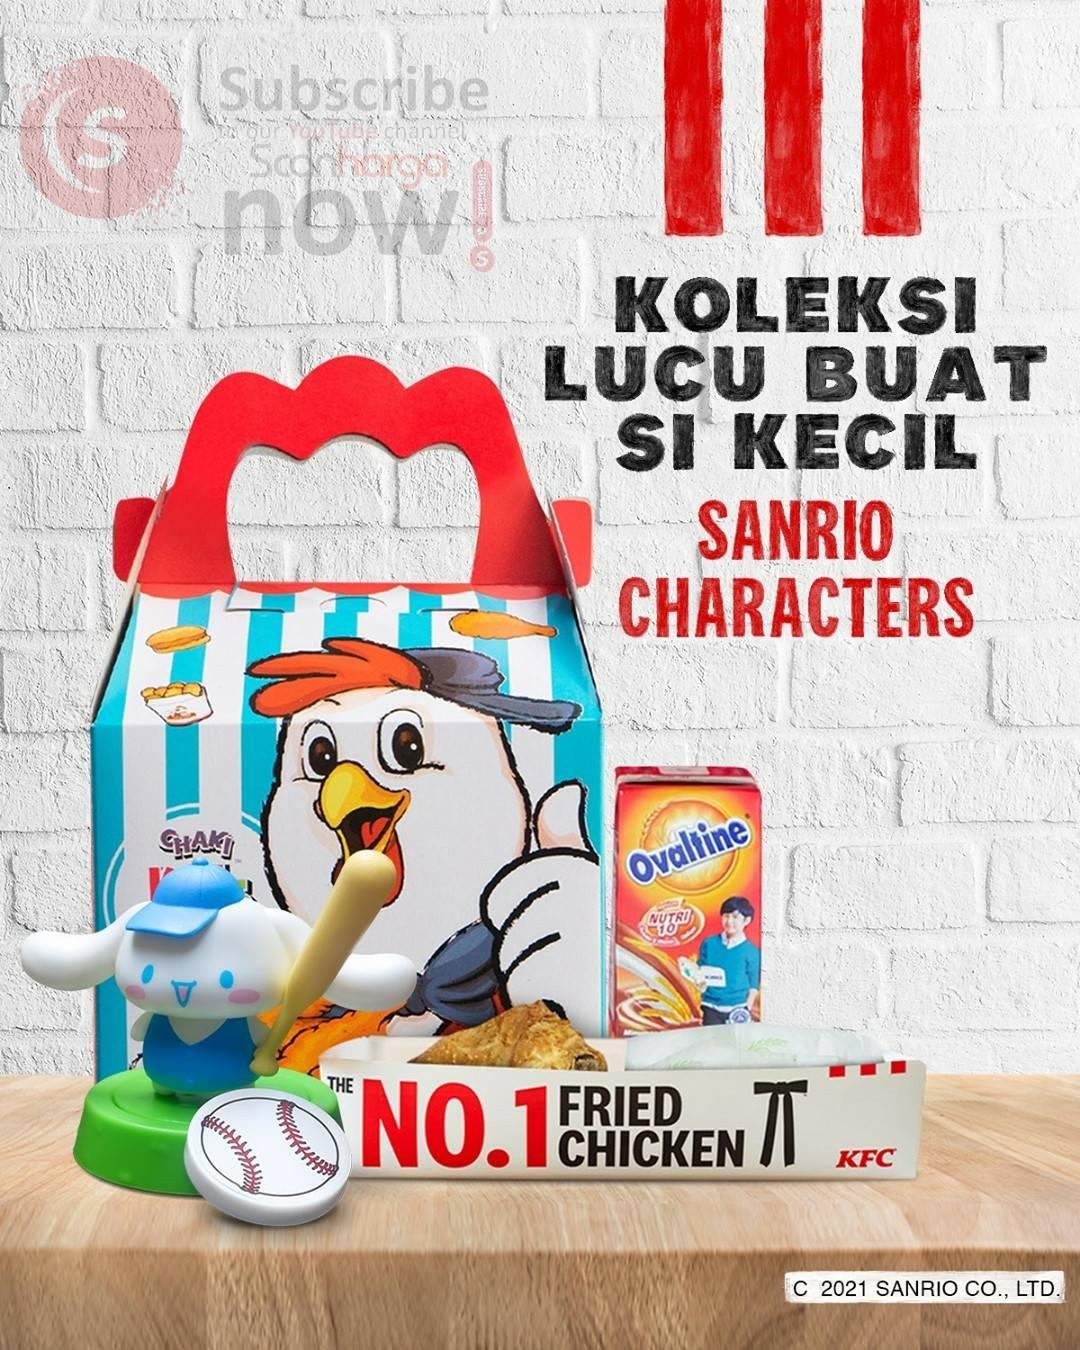 Promo KFC Beli Menu CKM (Chaki Kid Meal) Dapatkan Sanrio Characters